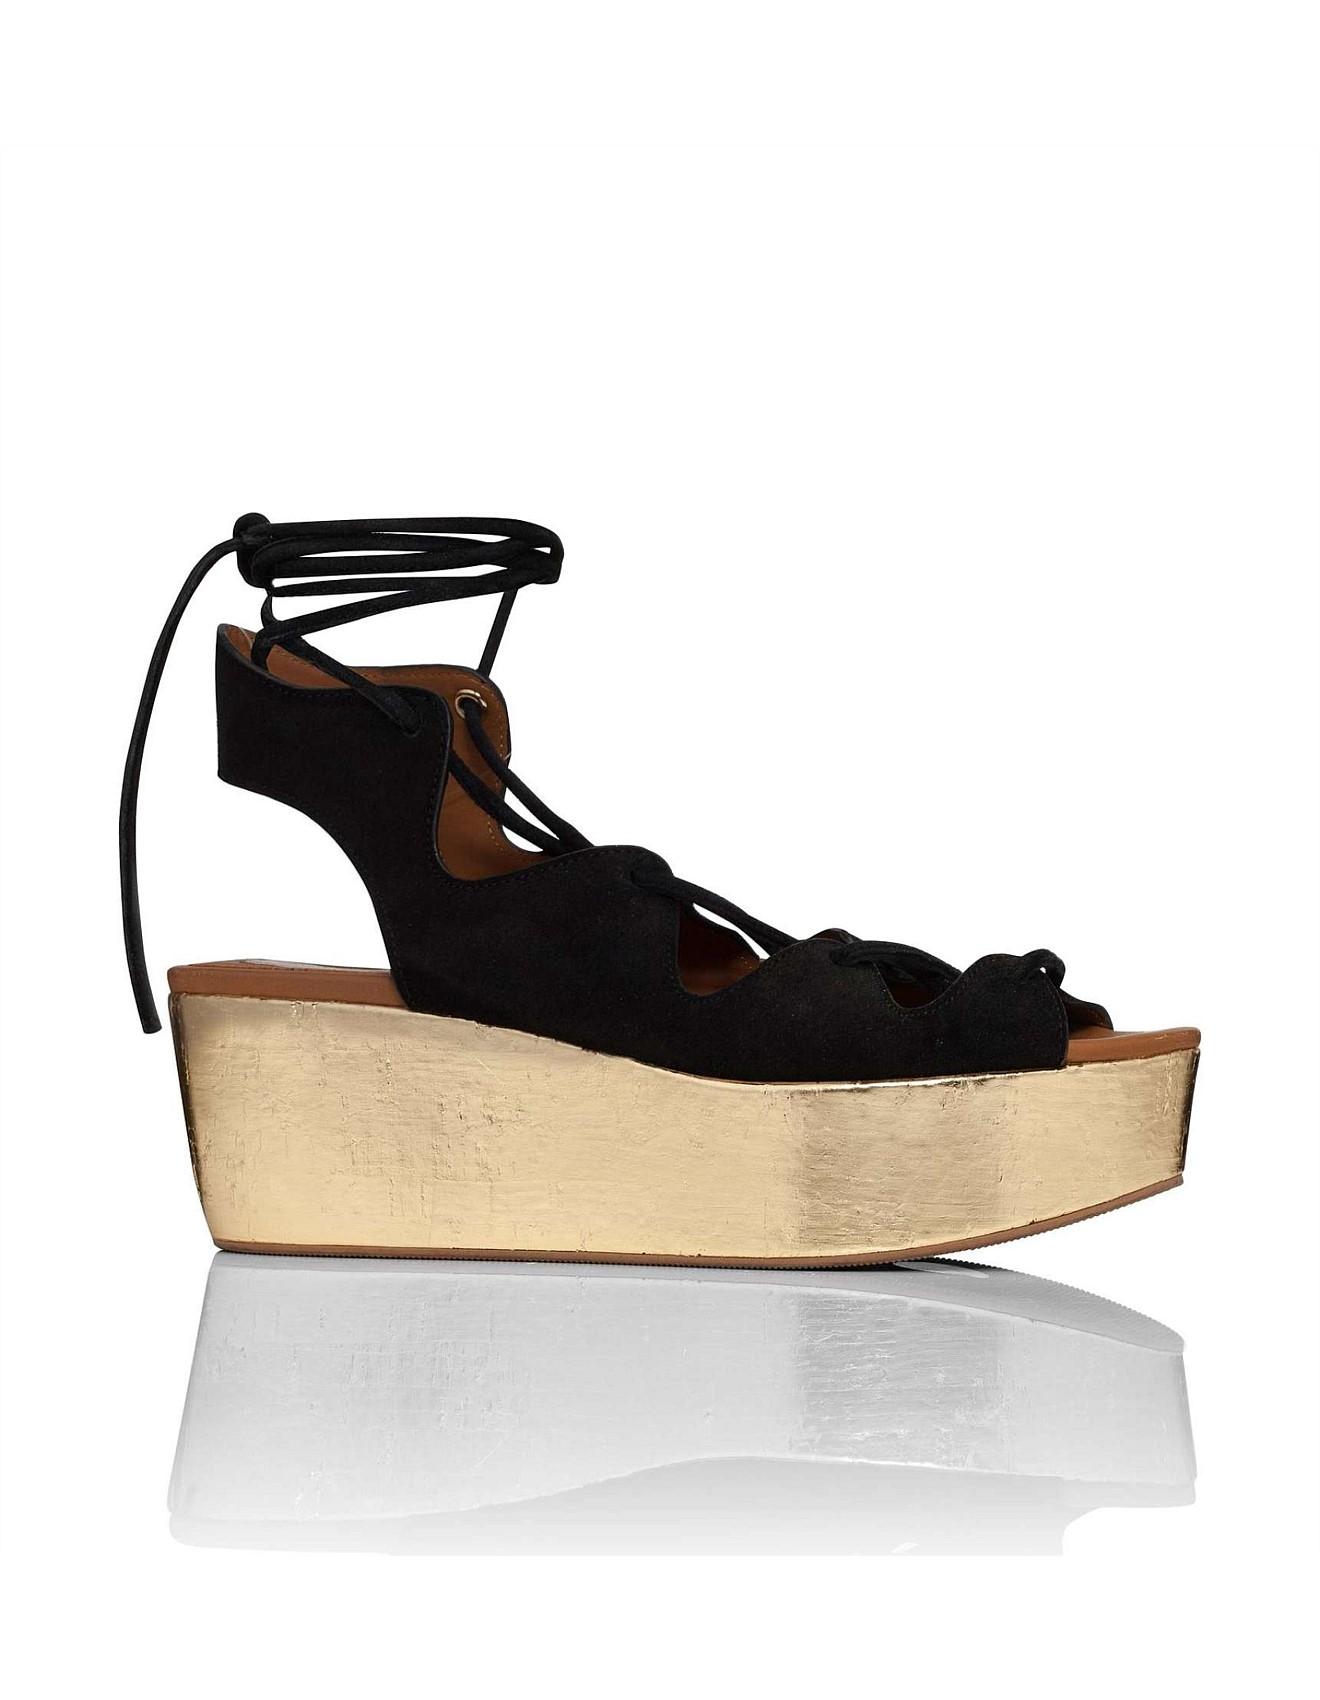 97e0723010a Sandals   Thongs - Corsetry Flatform Wedge Sandal (Liana)